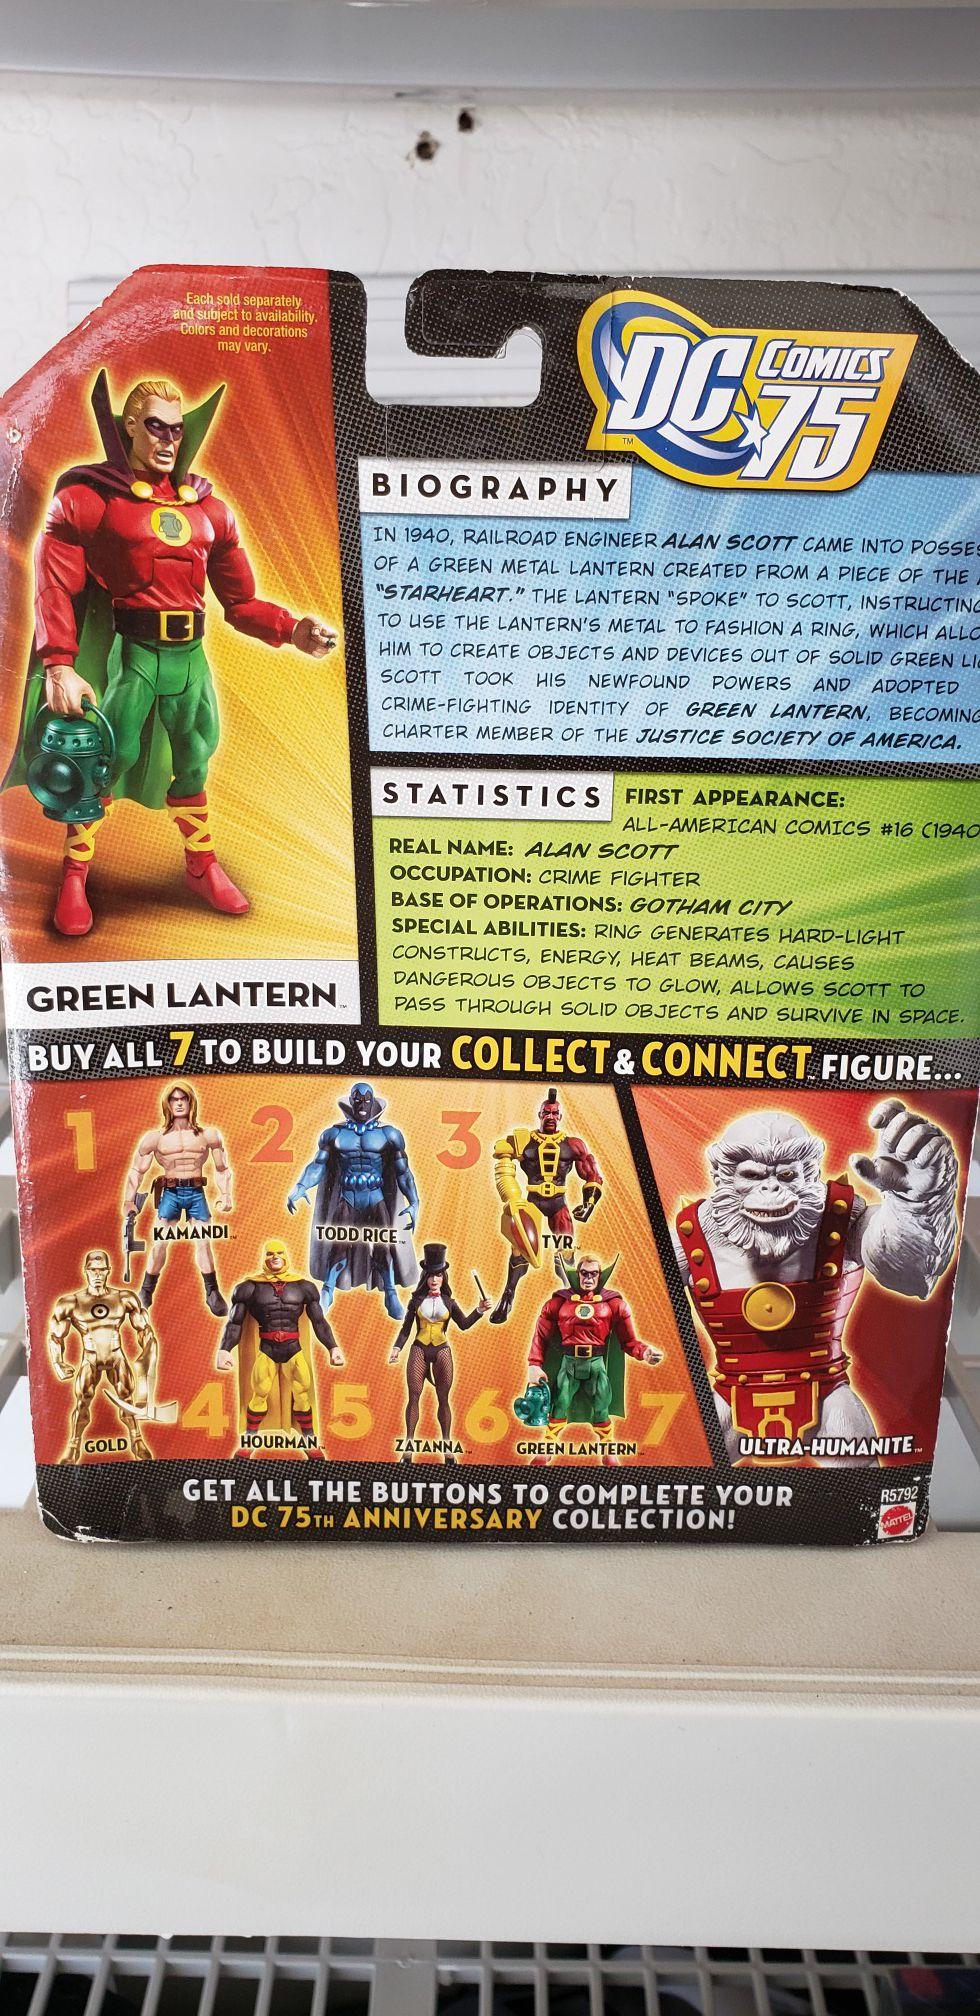 Original Green Lantern figure. Alan Scott